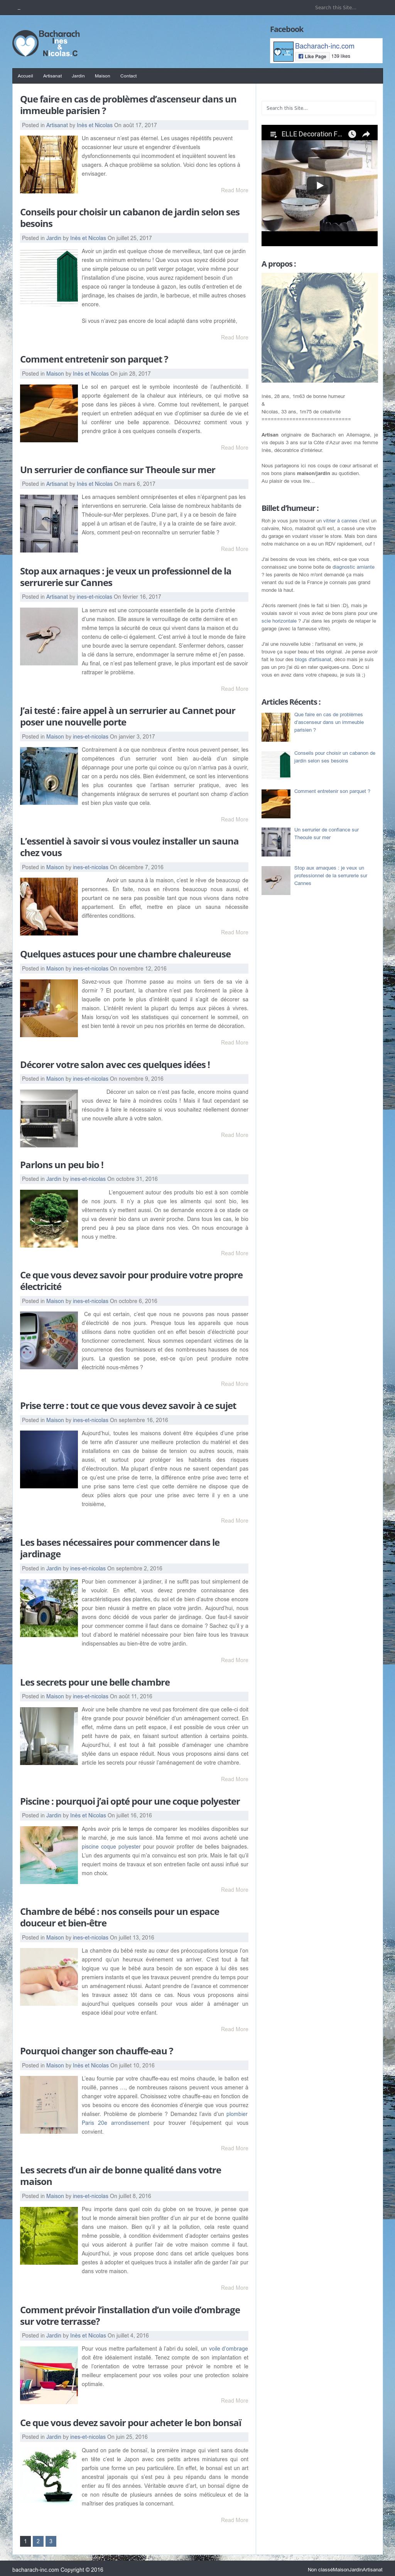 Prix D Un Sauna bacharach inc competitors, revenue and employees - owler